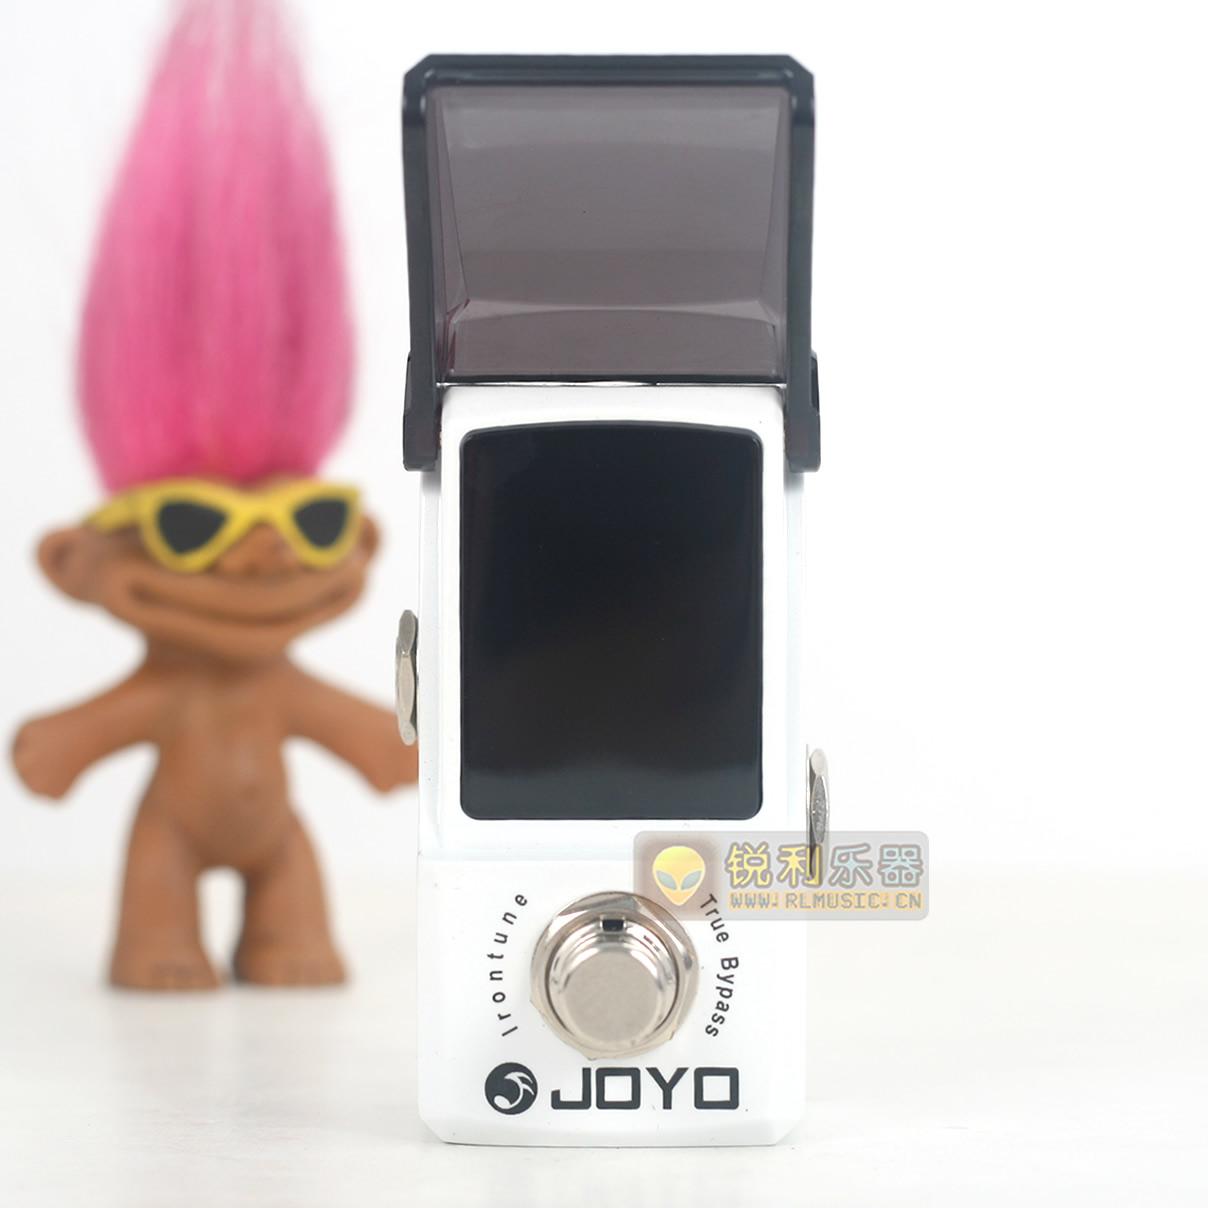 【Joyo JF-326 Irontune】吉他贝斯调音表校音效果器【锐利乐器】